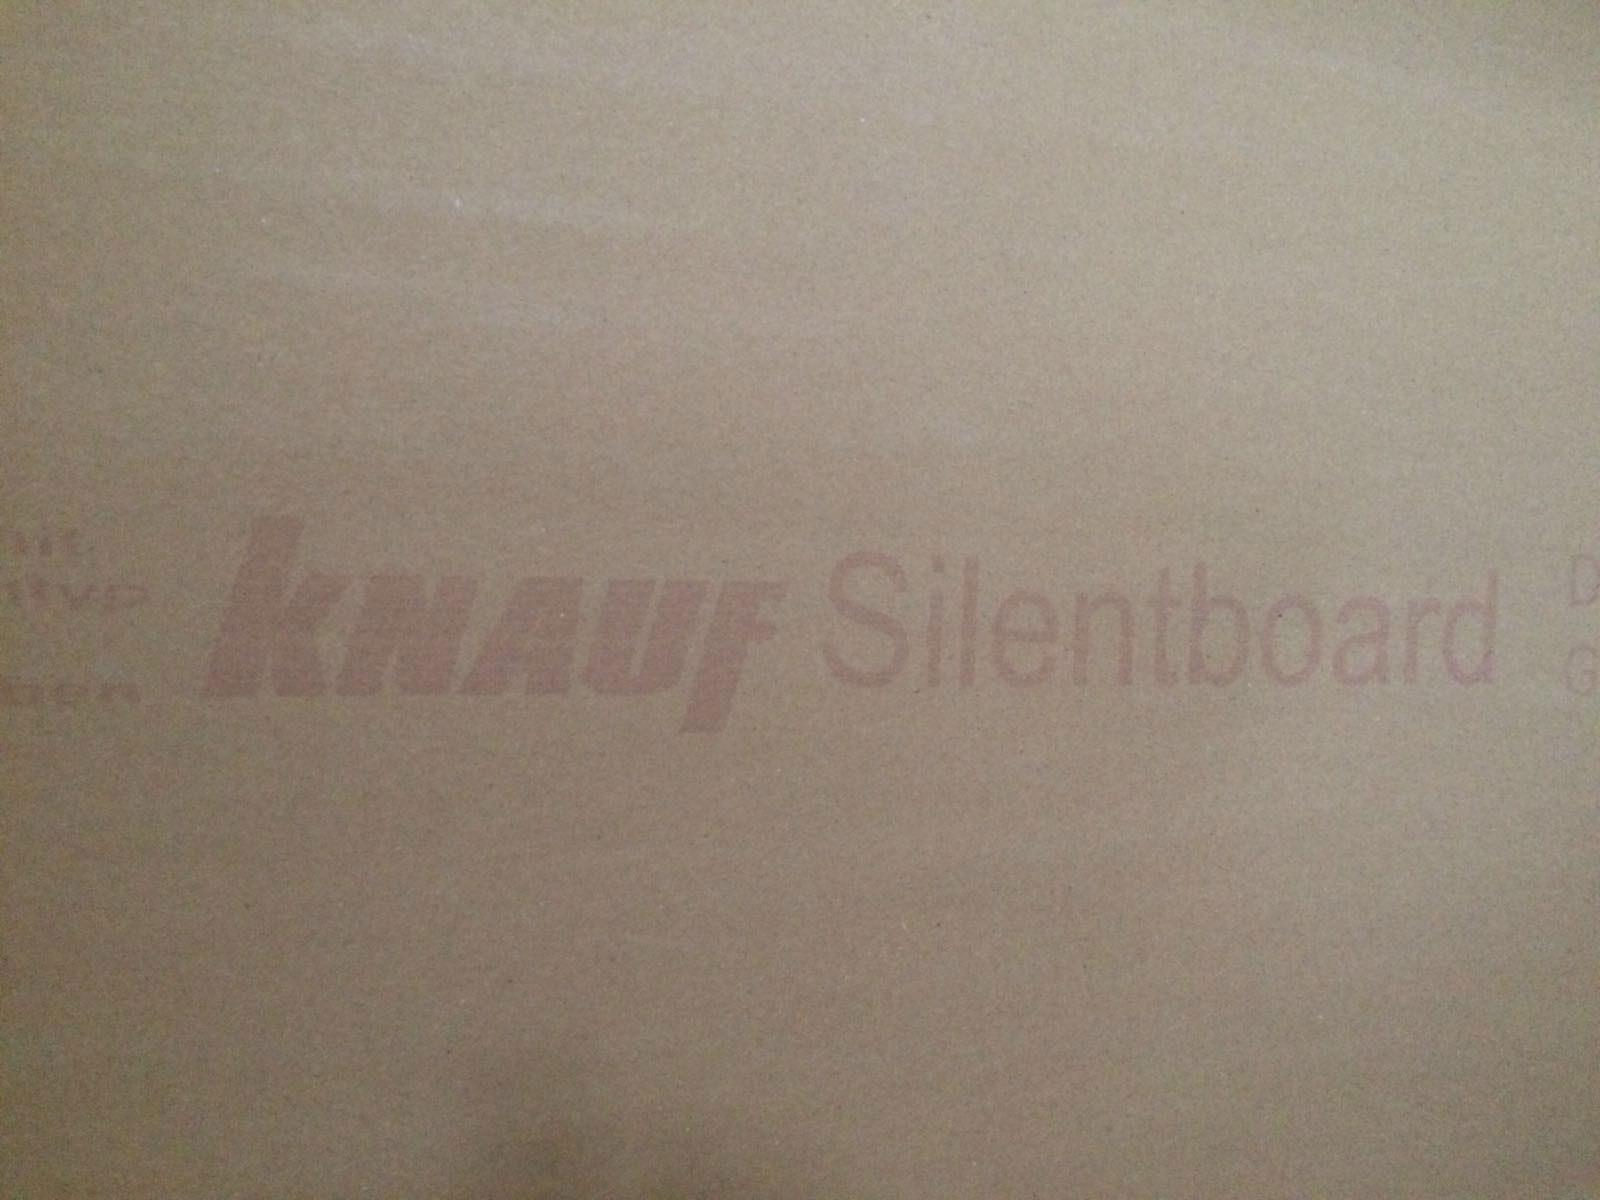 zvuková izolace - Knauf Silent board